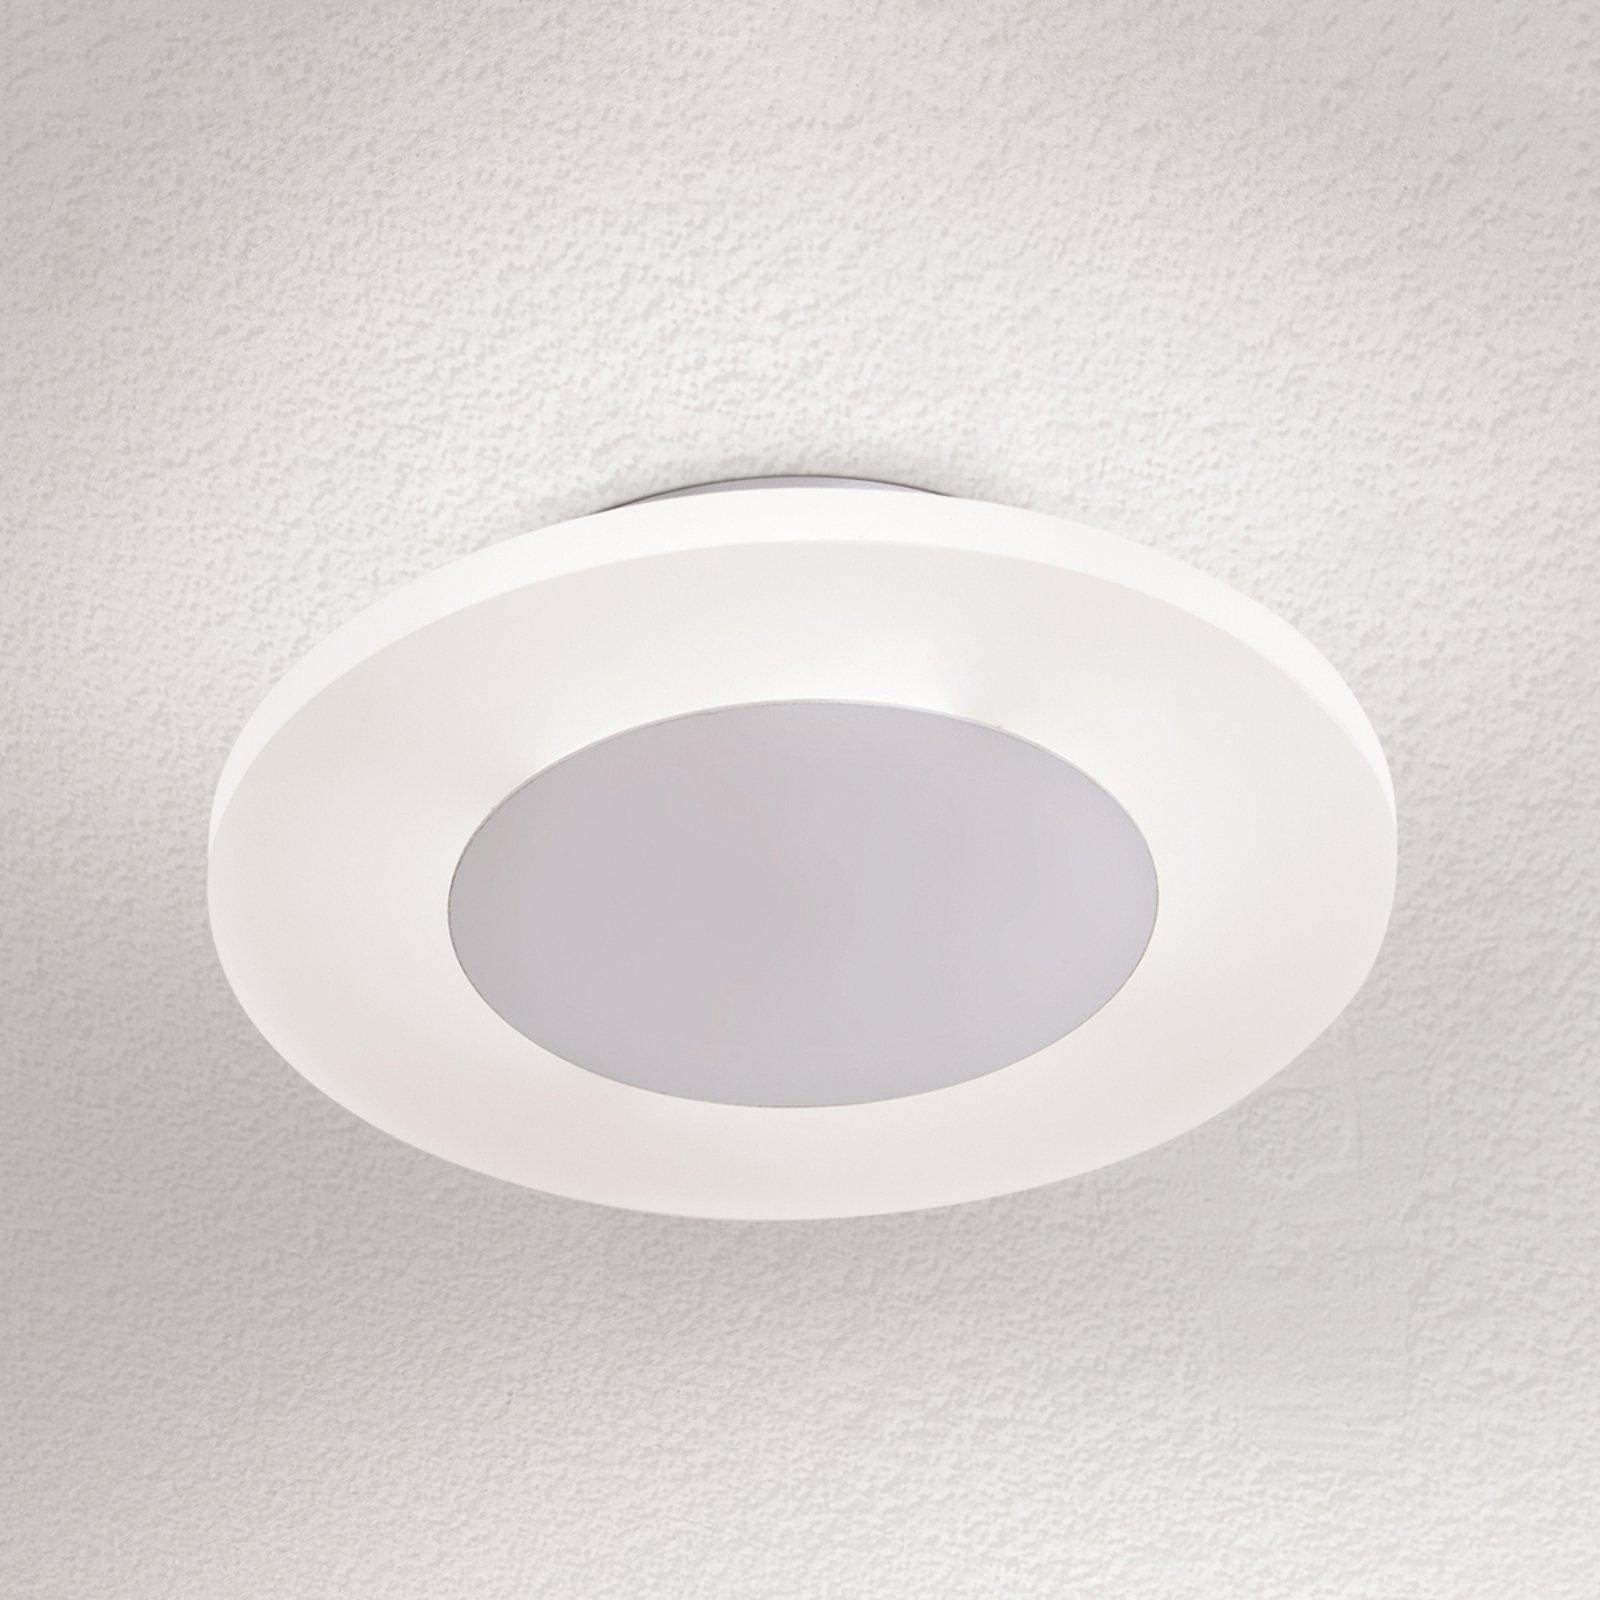 LED-taklampe Karia rund 20 cm